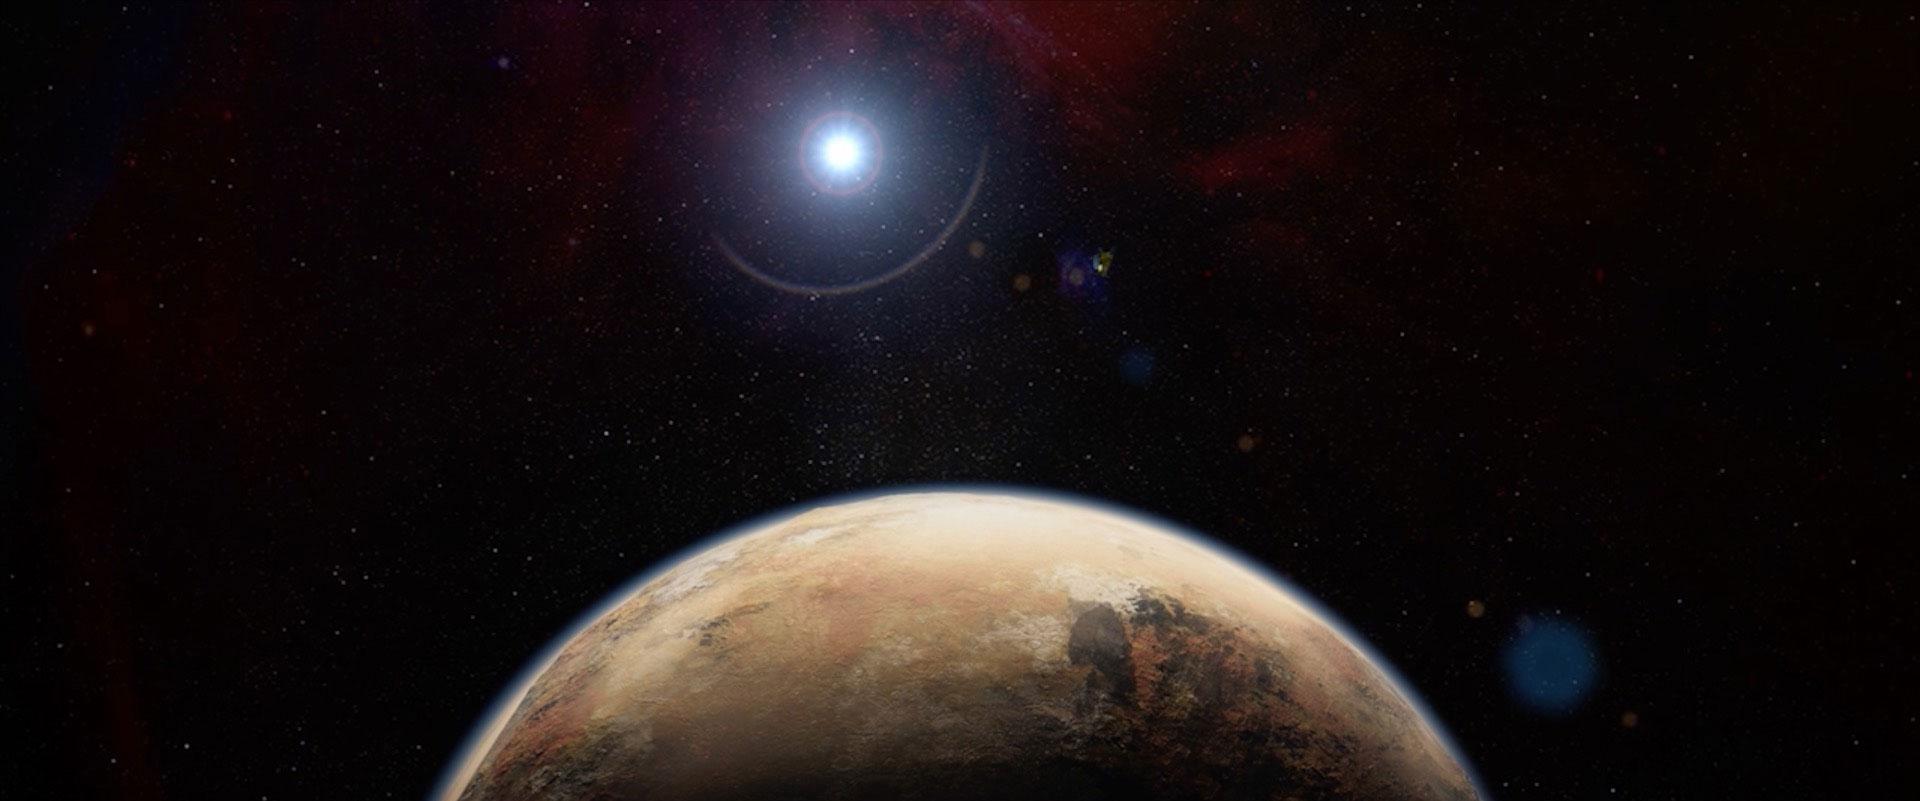 Nakon ledenih planina, otkrivene i Plutonove ledene doline